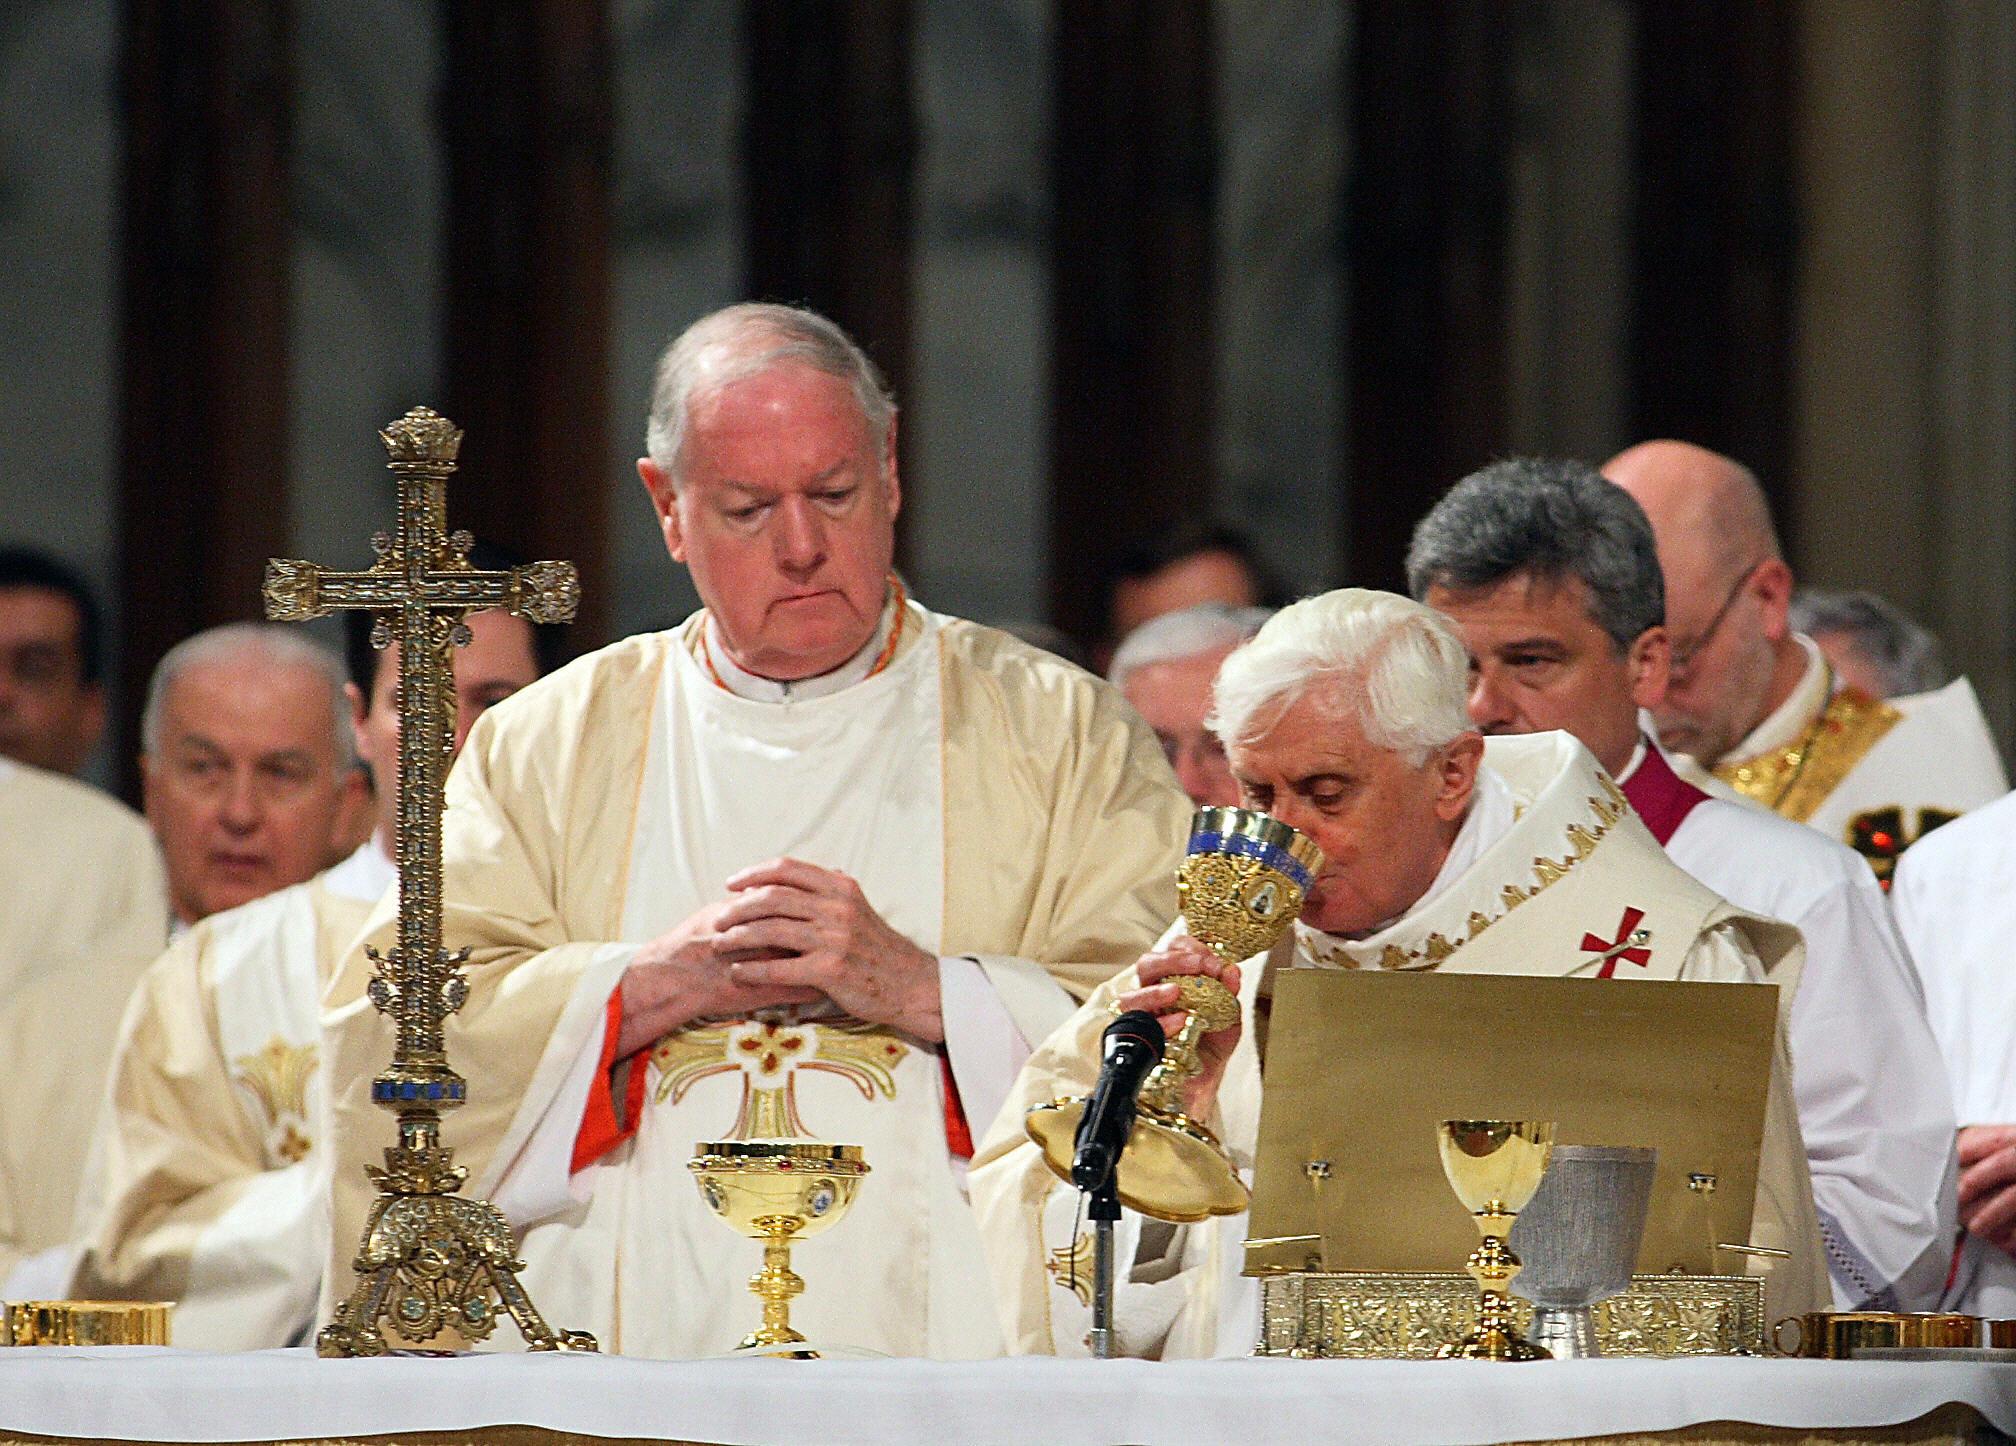 Edward Egan, Cardinal Edward Egan, Archbishop Edward Egan